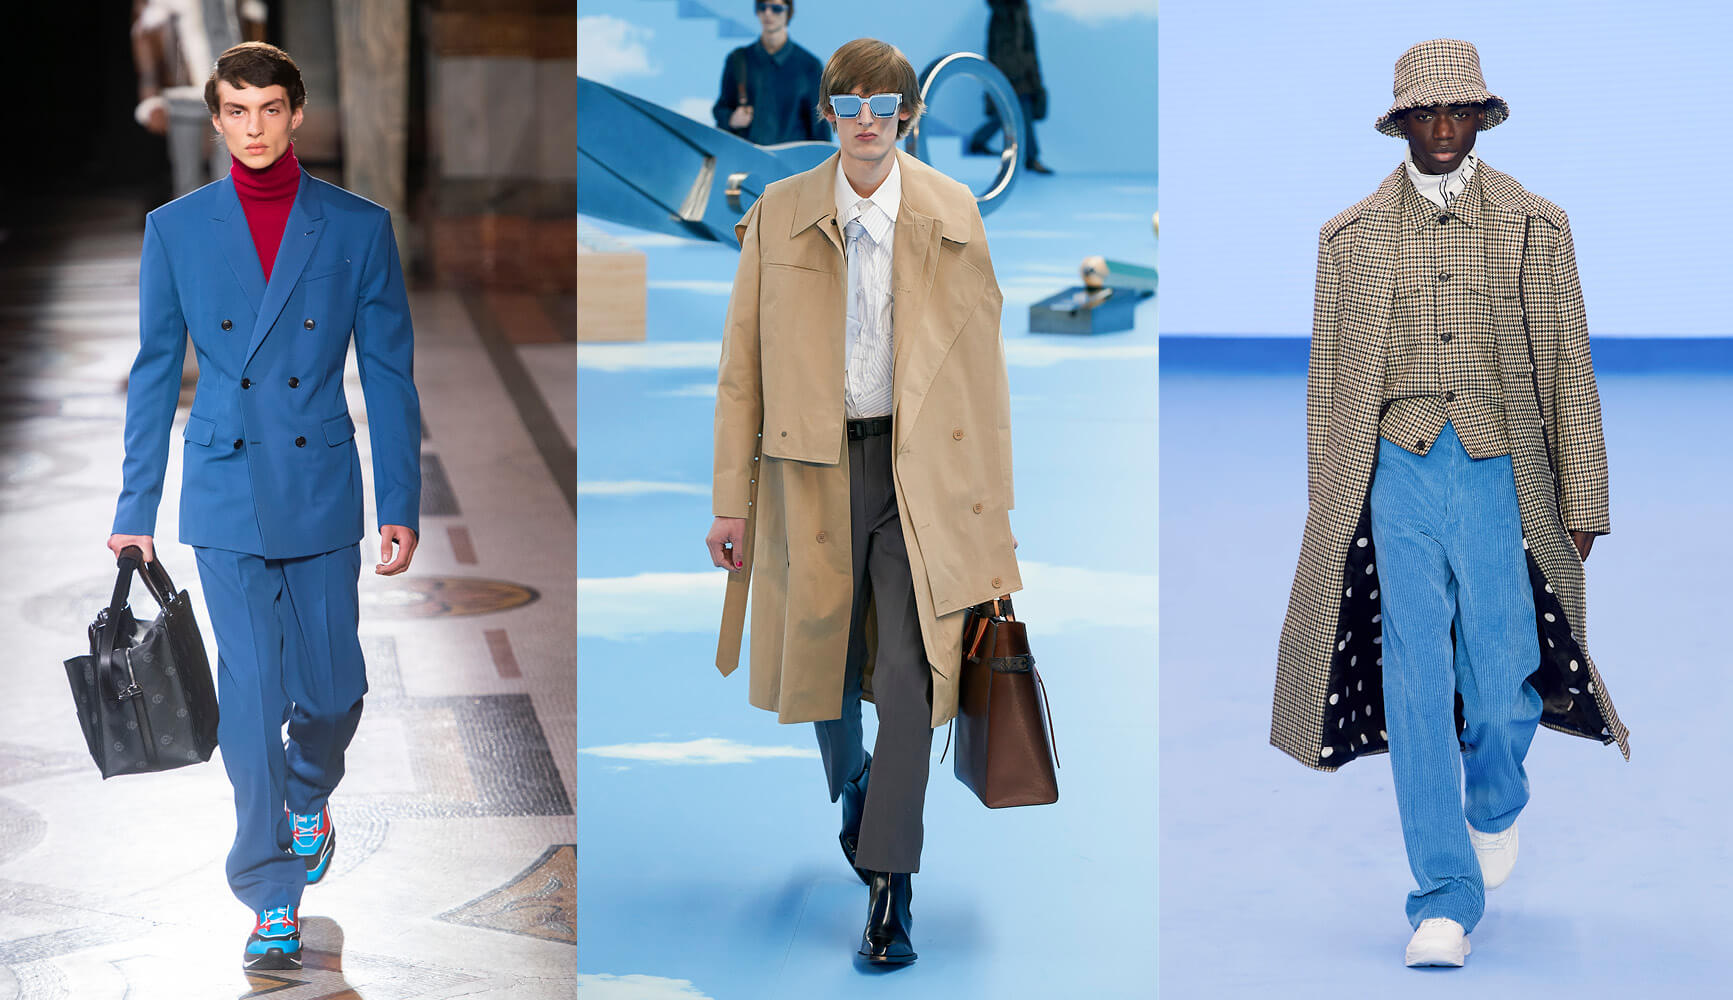 Büro Outfit, Runways von Berluti, Louis Vuitton, Paul Smith